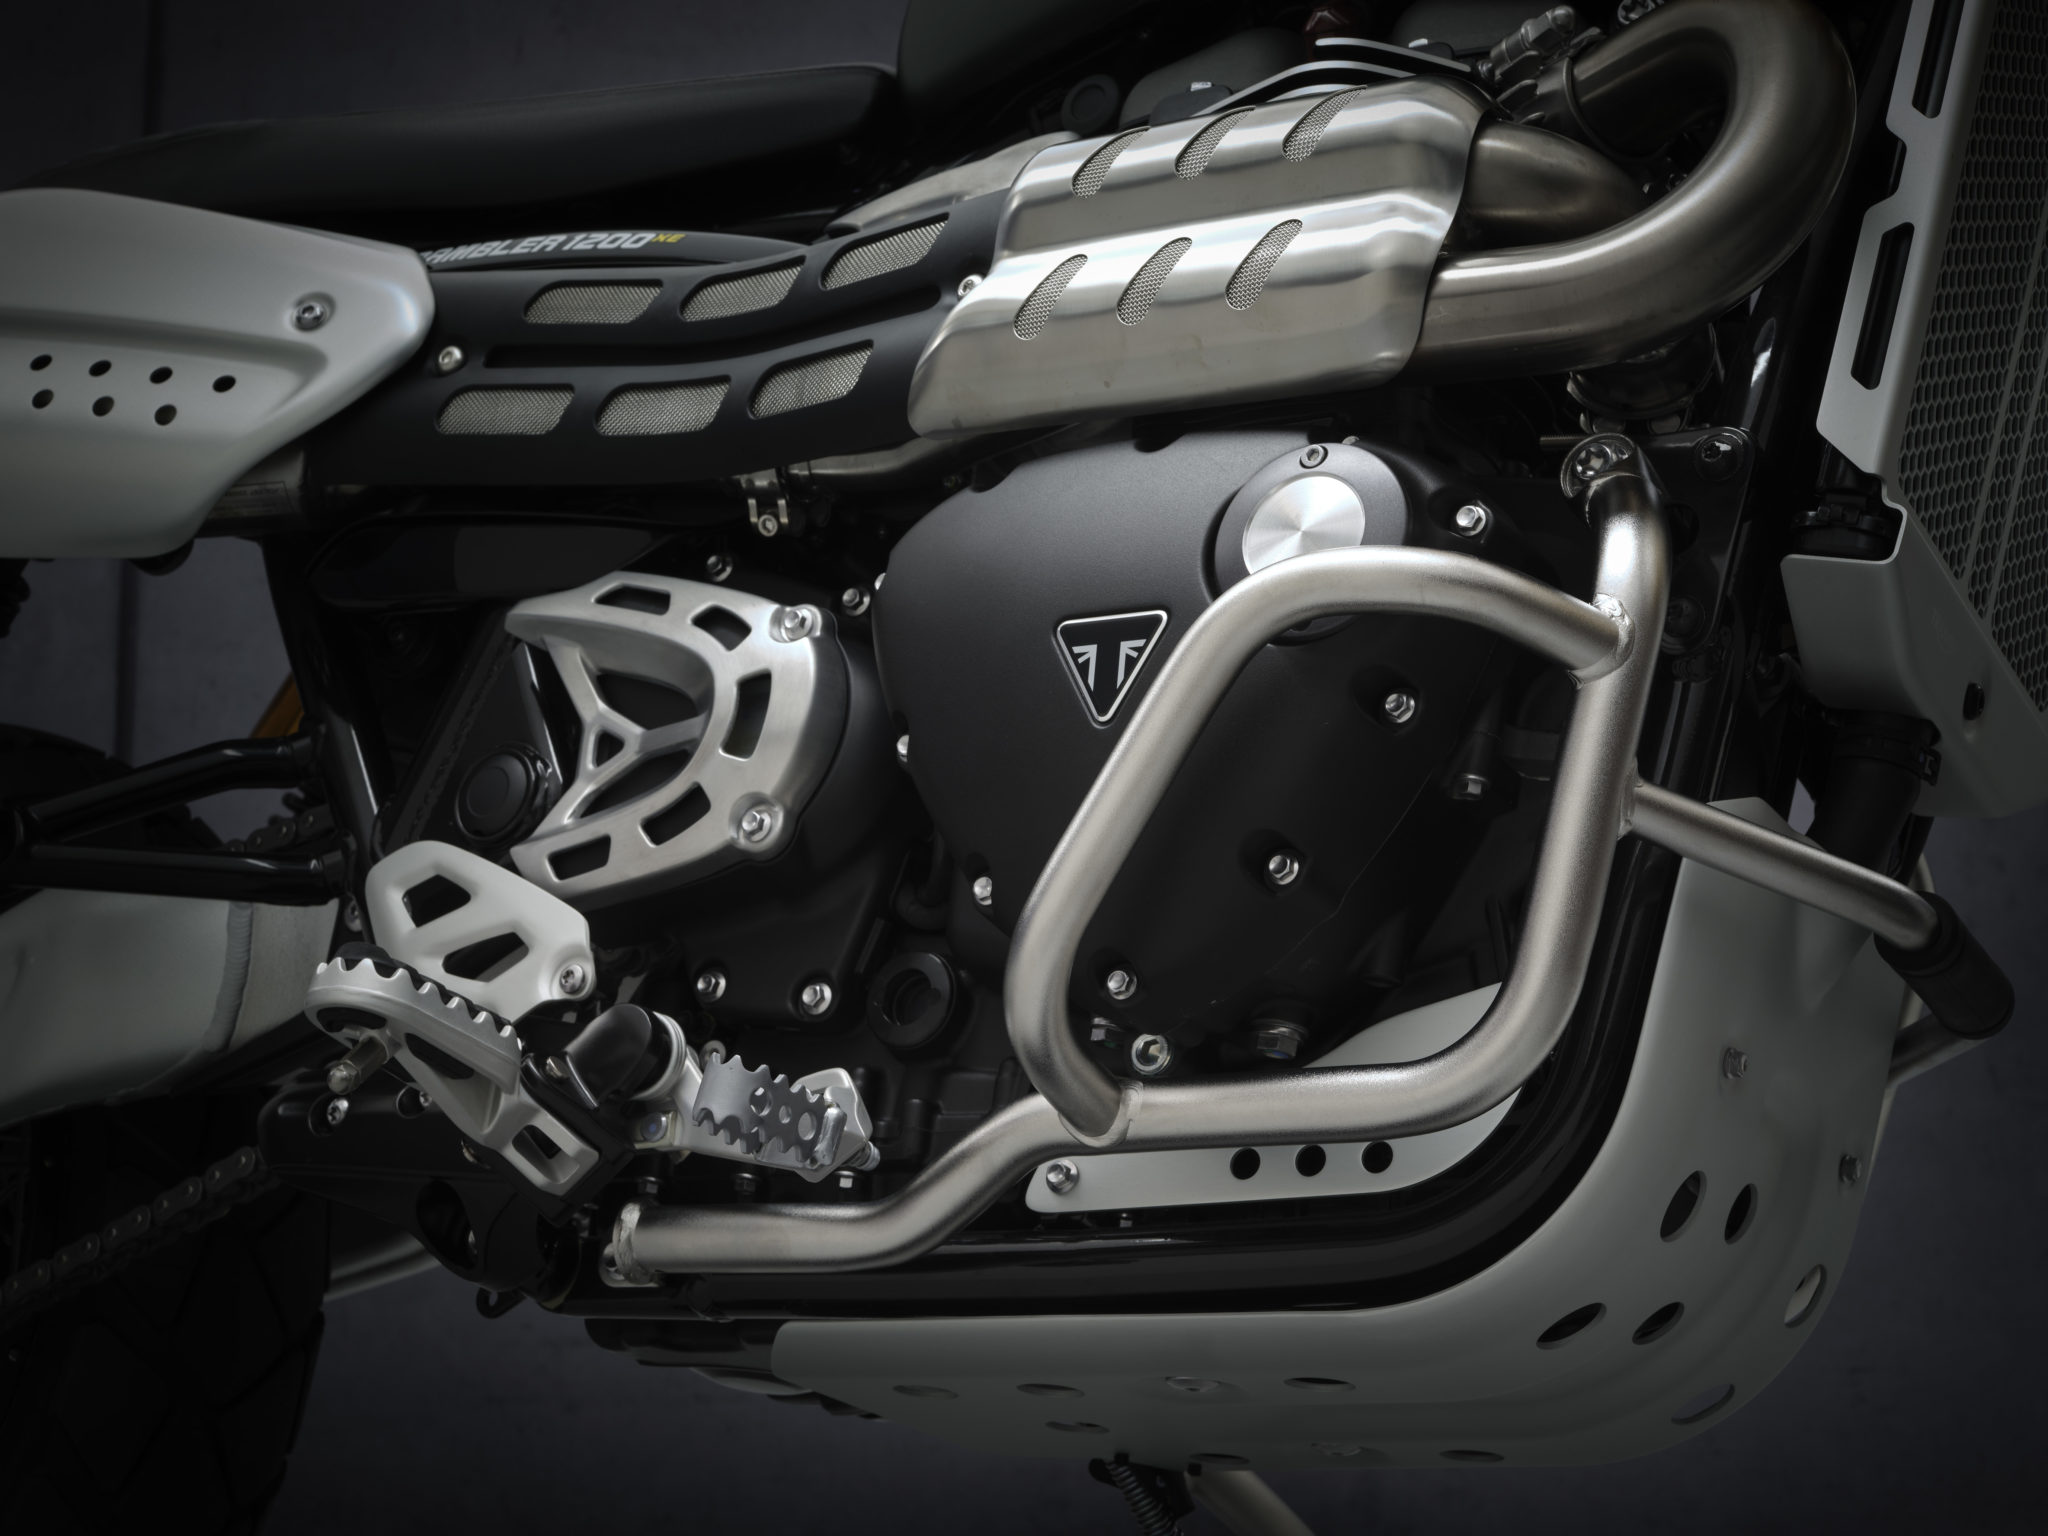 Triumph Scrambler 1200 series overhauled for 2021